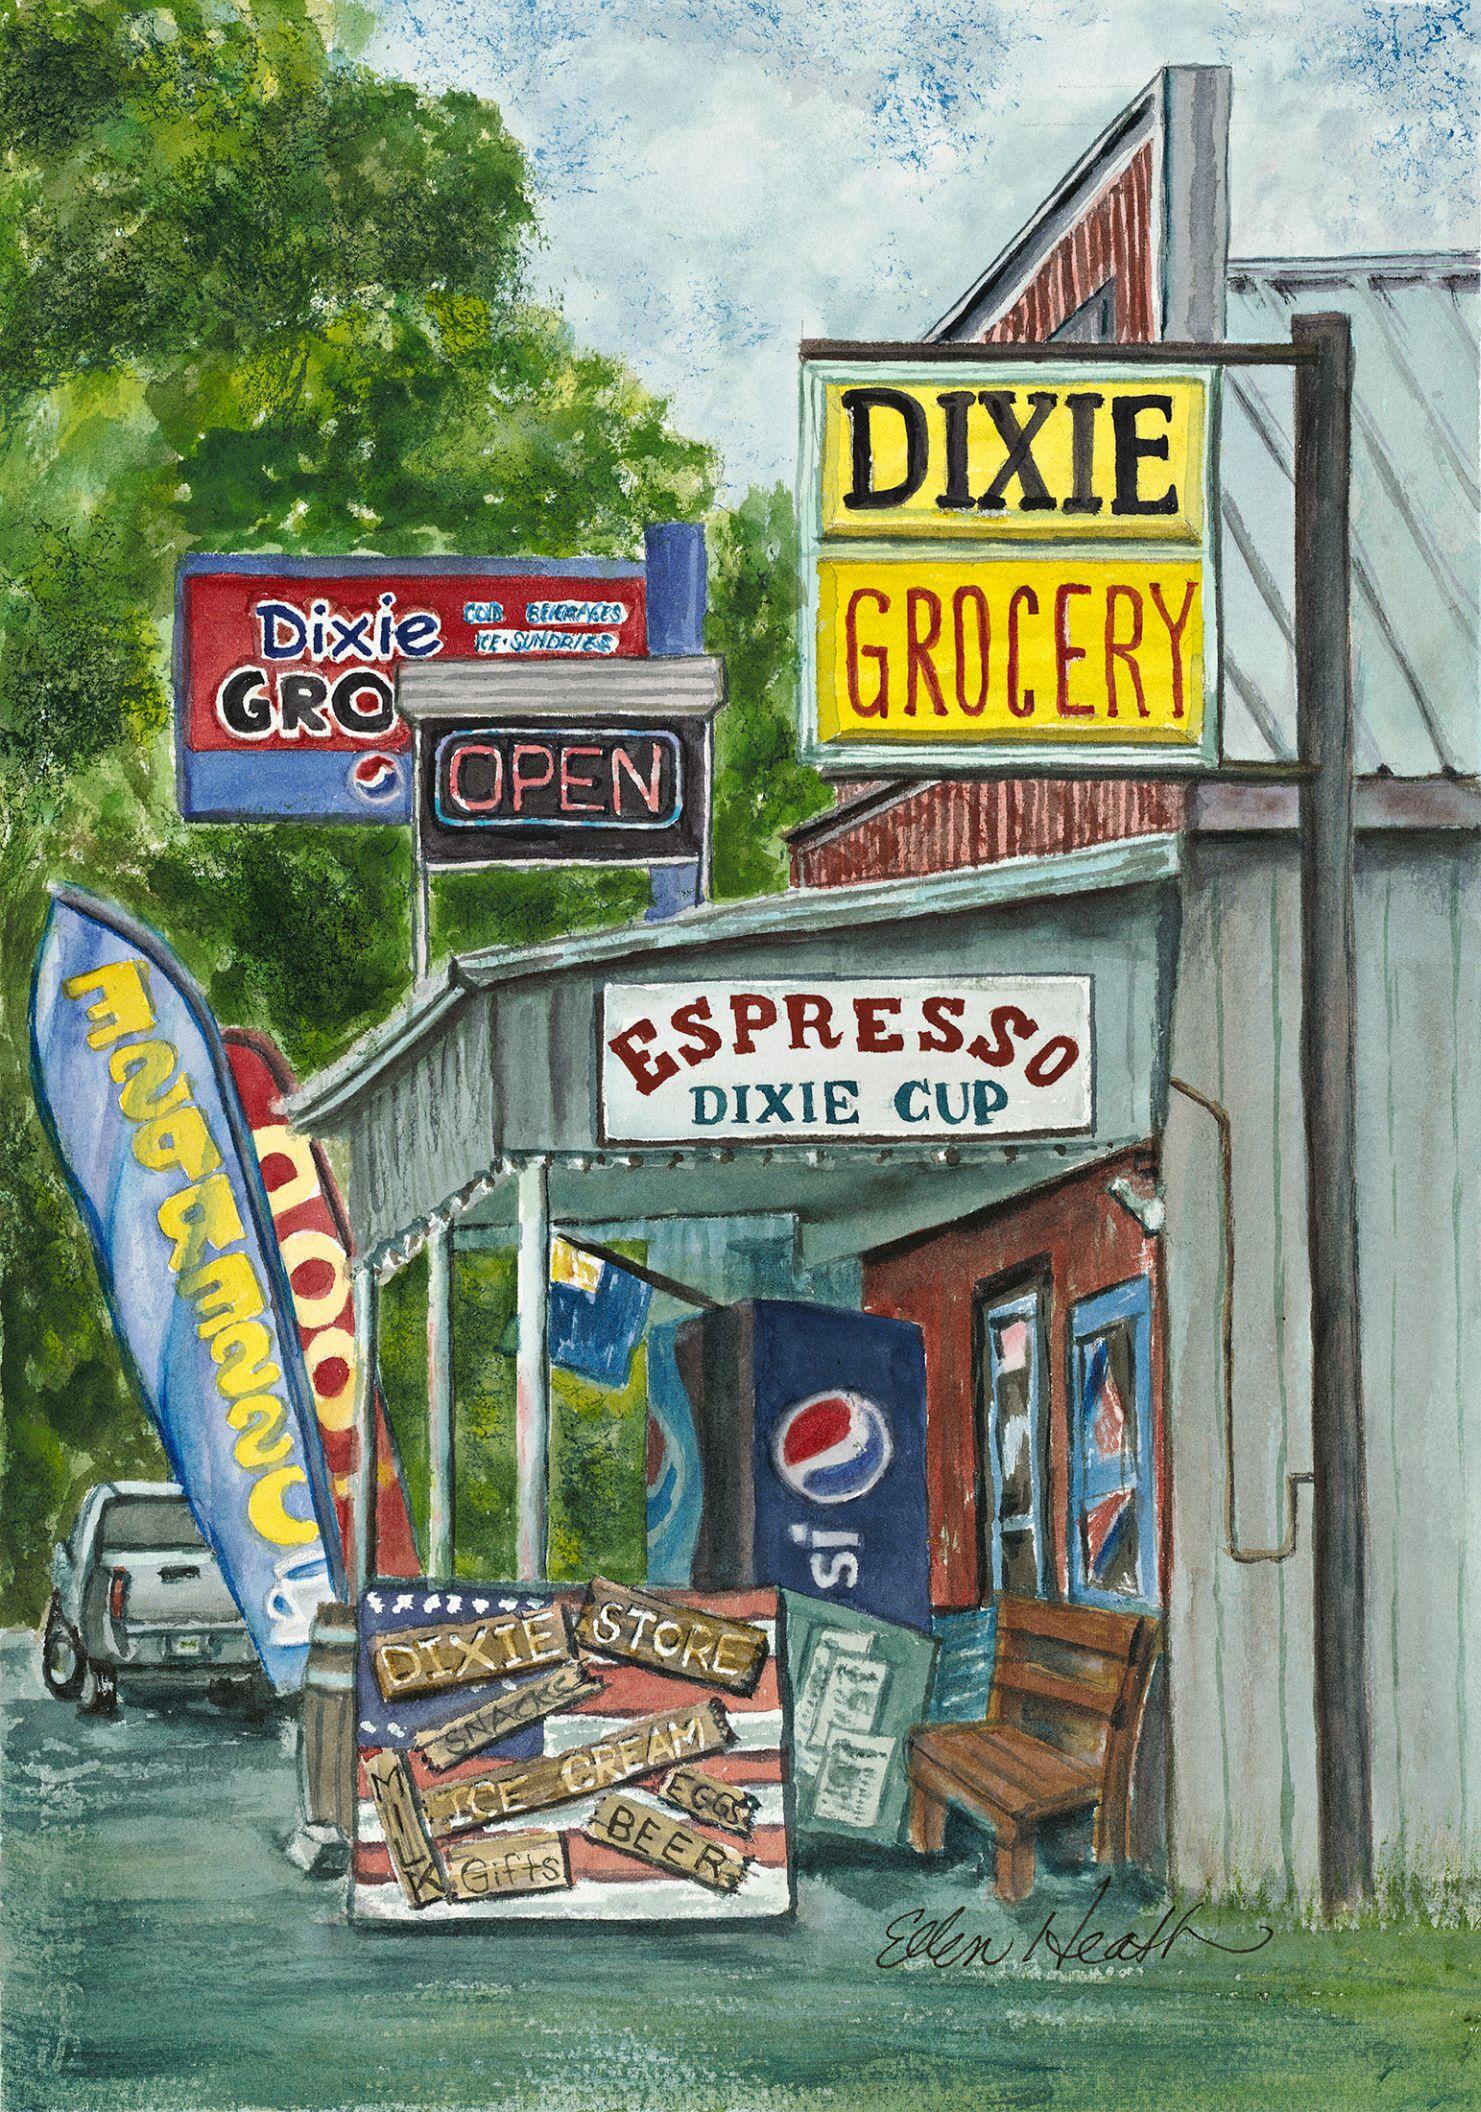 Dixie Grocery